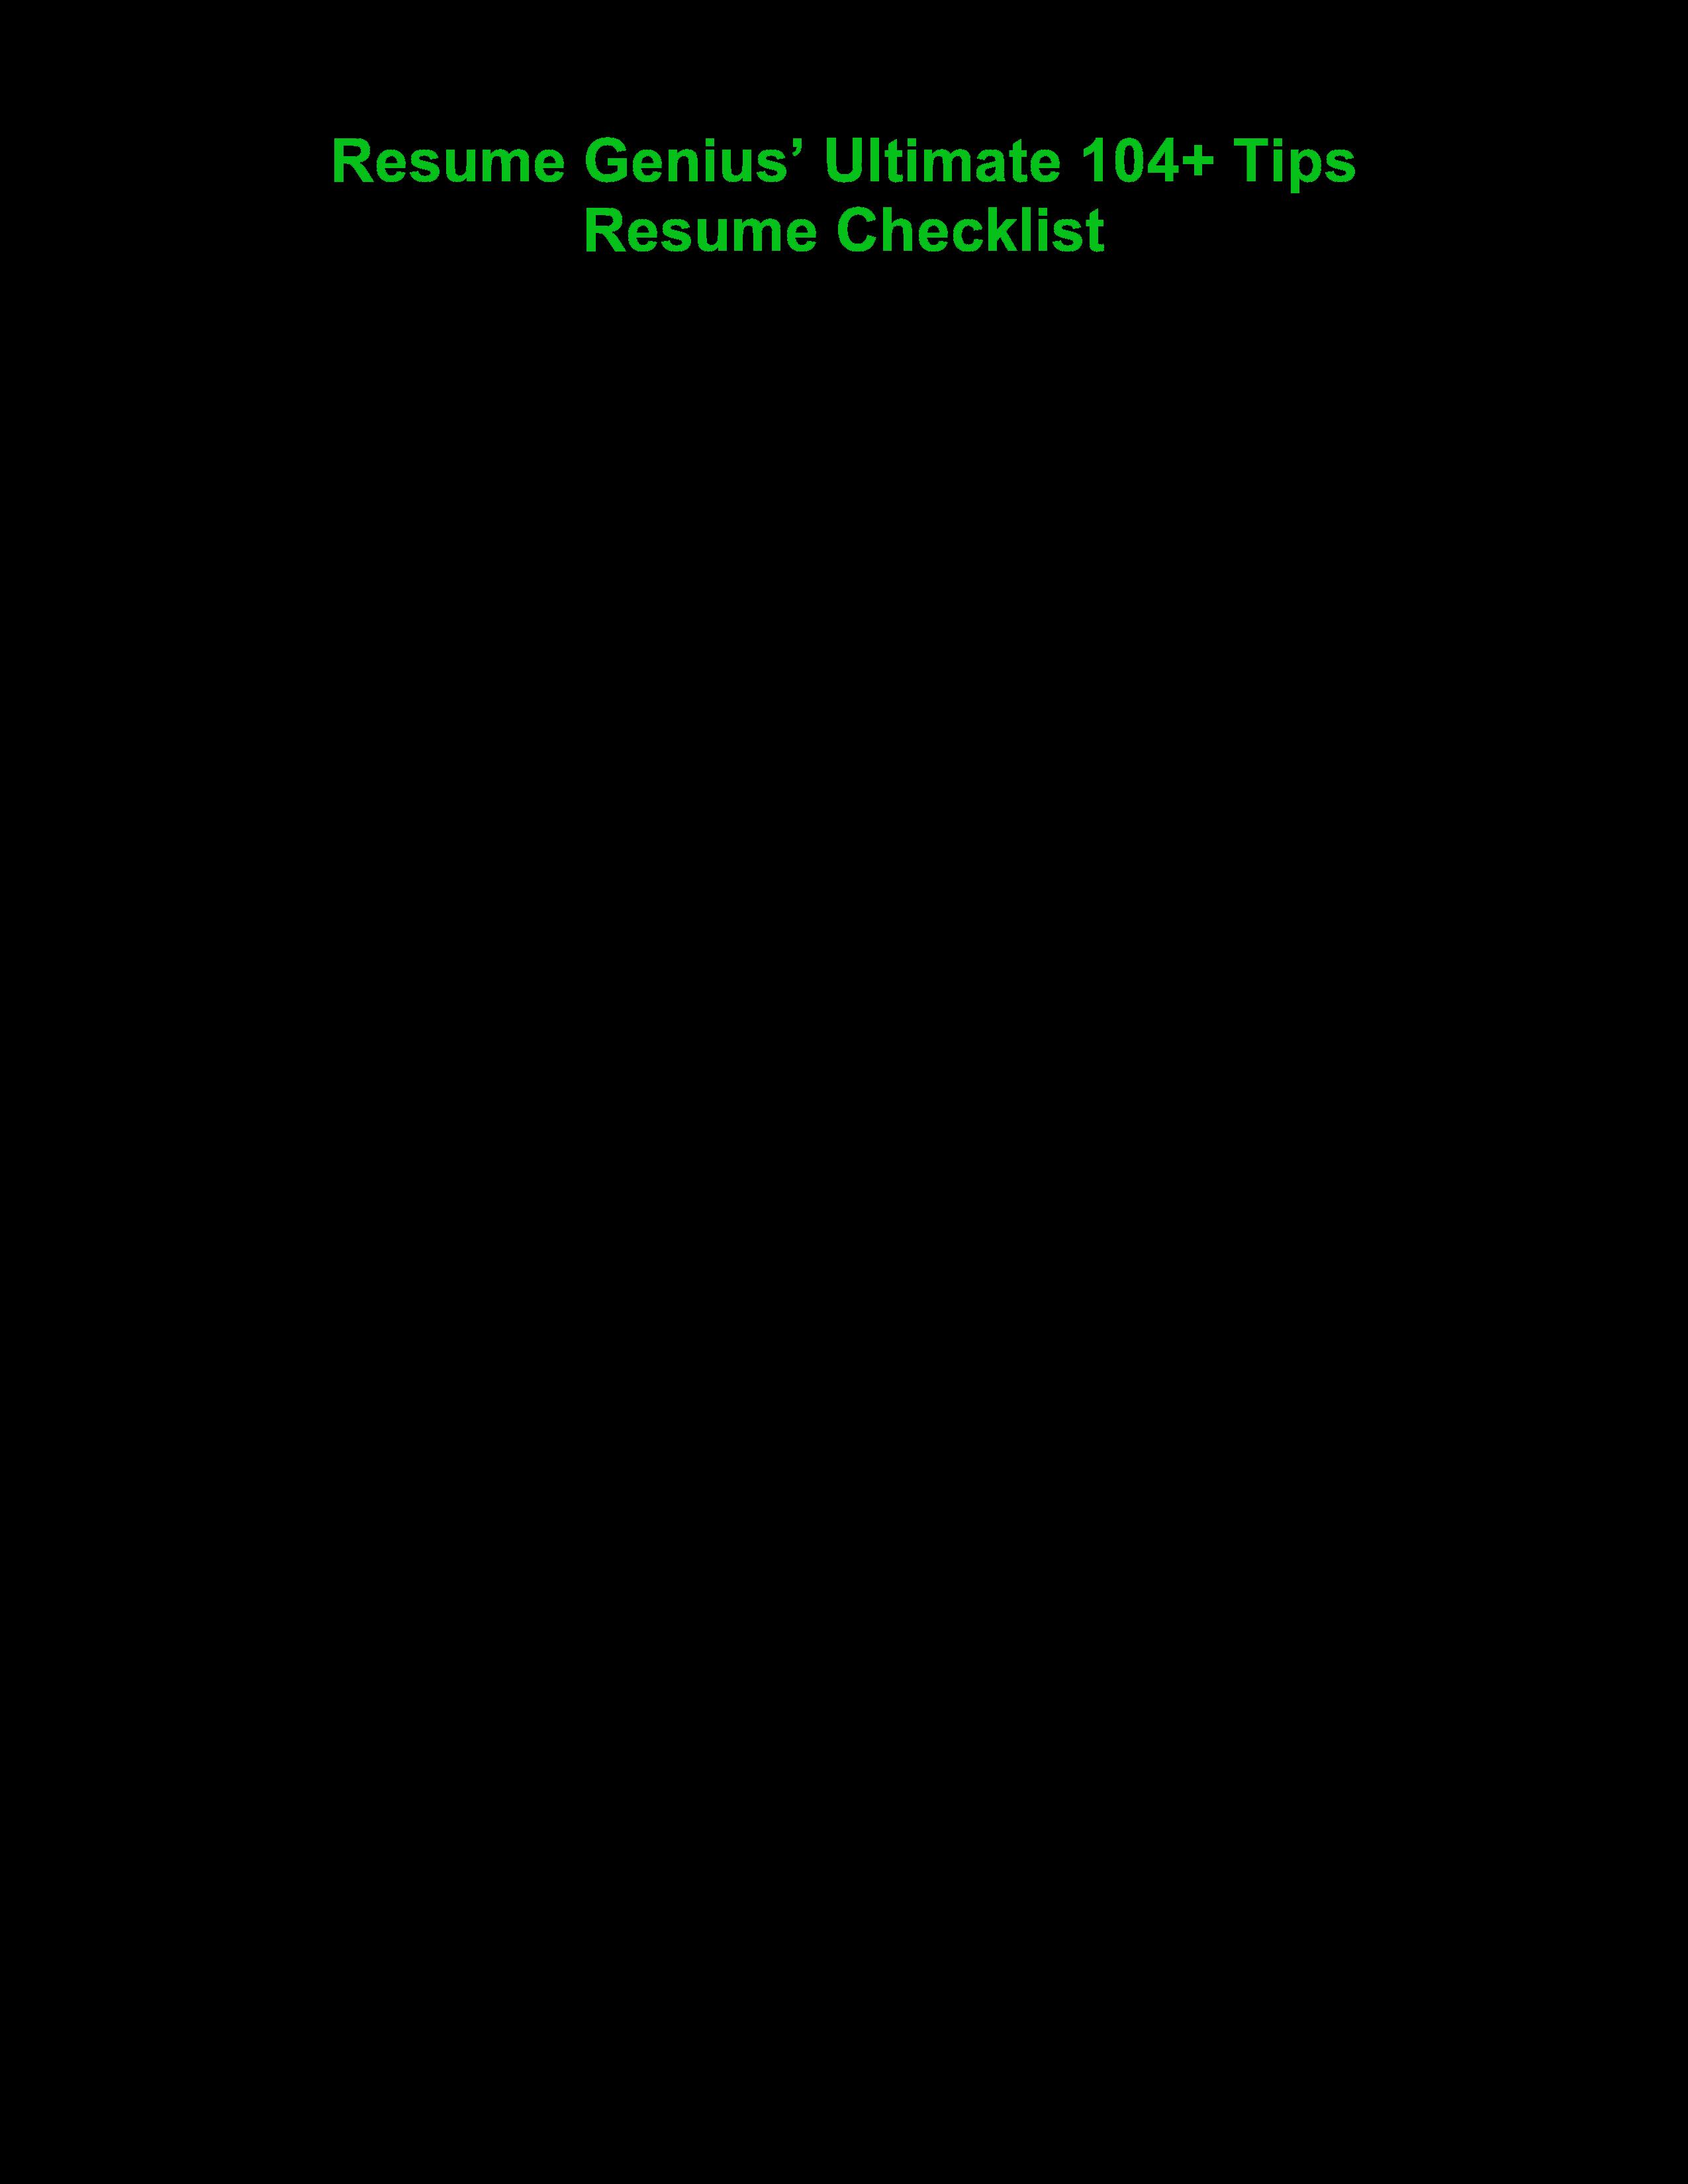 Free Microsoft Word - Resume Genius\'S Resume Checklist.Docx ...